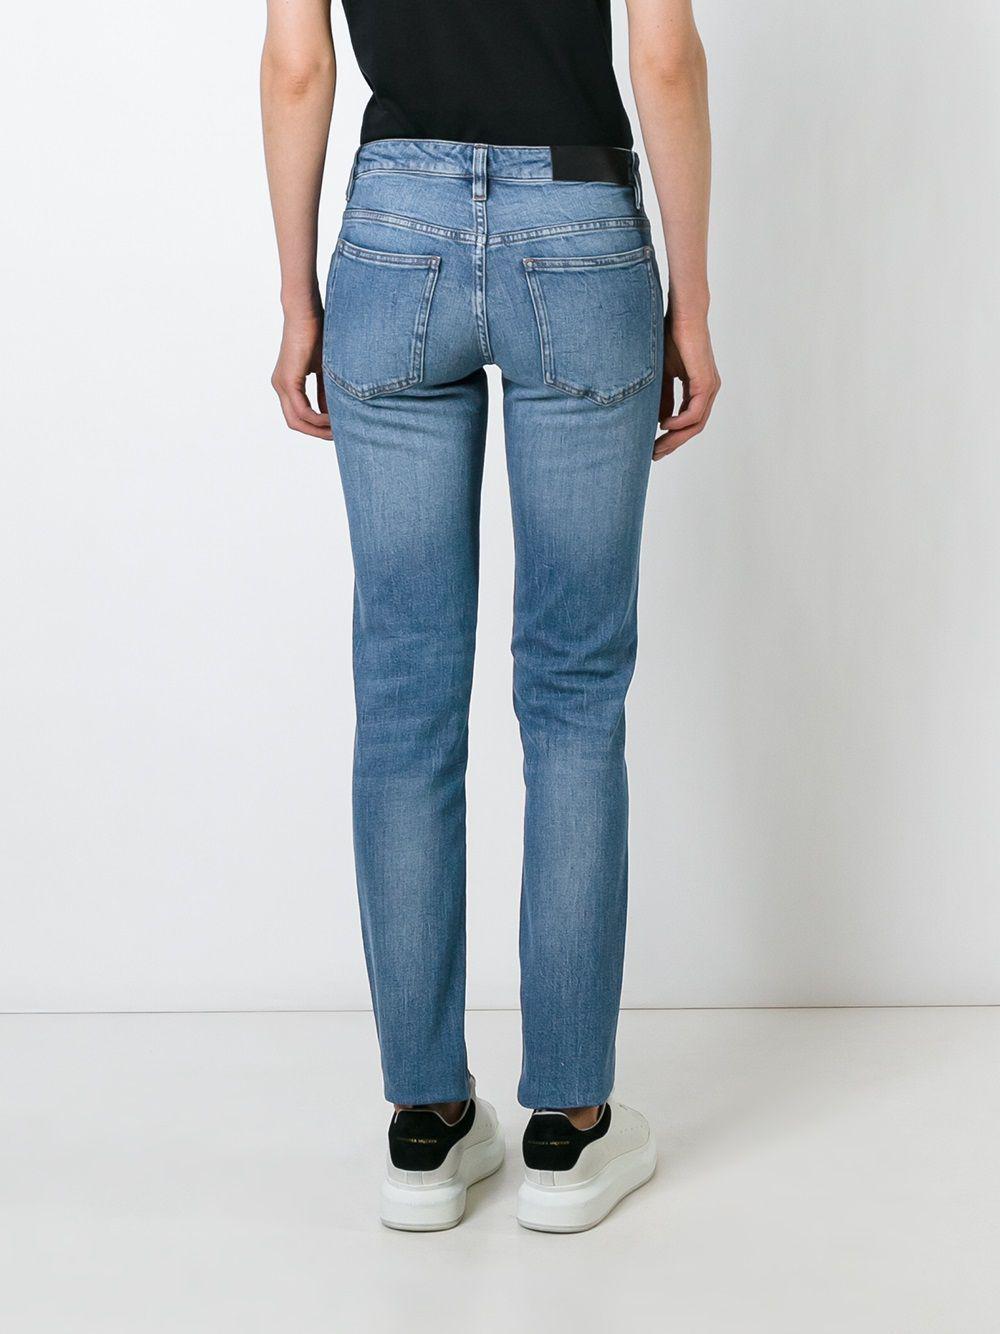 Victoria, Victoria Beckham Denim Skinny Jeans in Blue